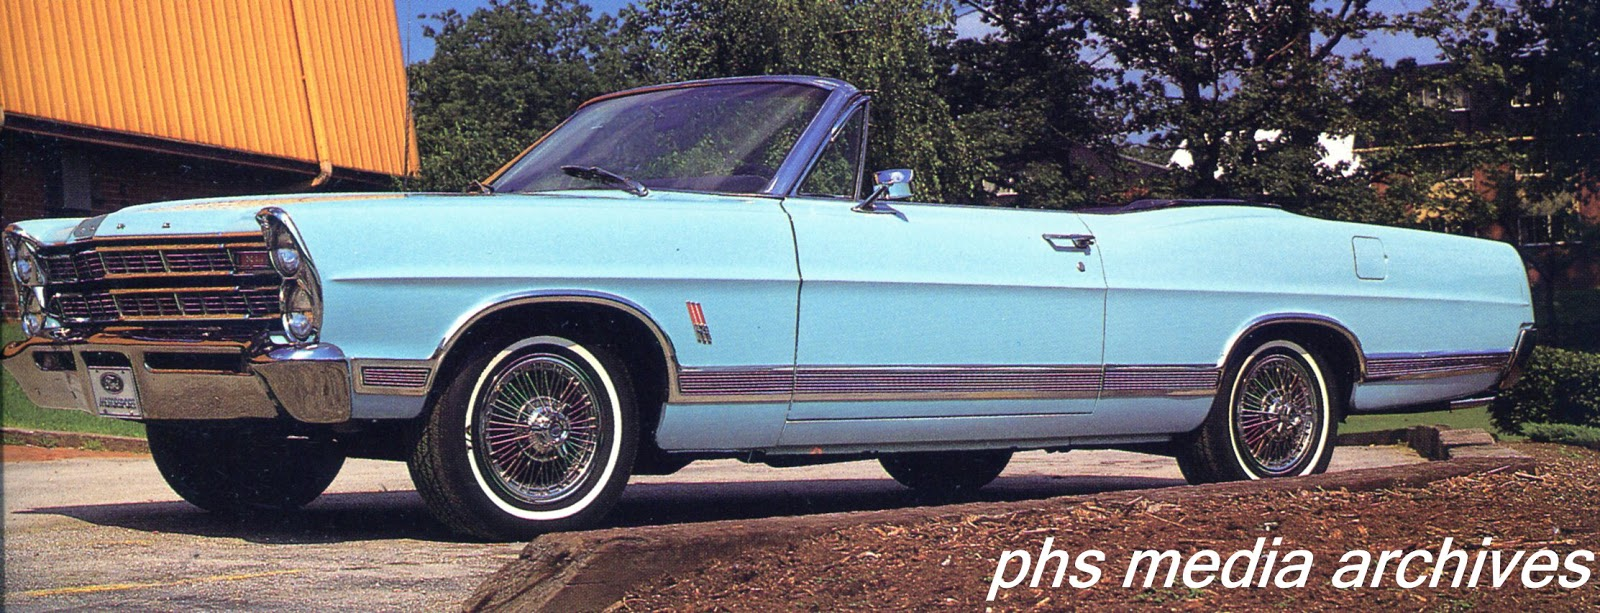 1967 68 Ford Galaxie 500 Xl Battlestar Galaxieca Phscollectorcarworld 1969 Bronco Wiring Diagram